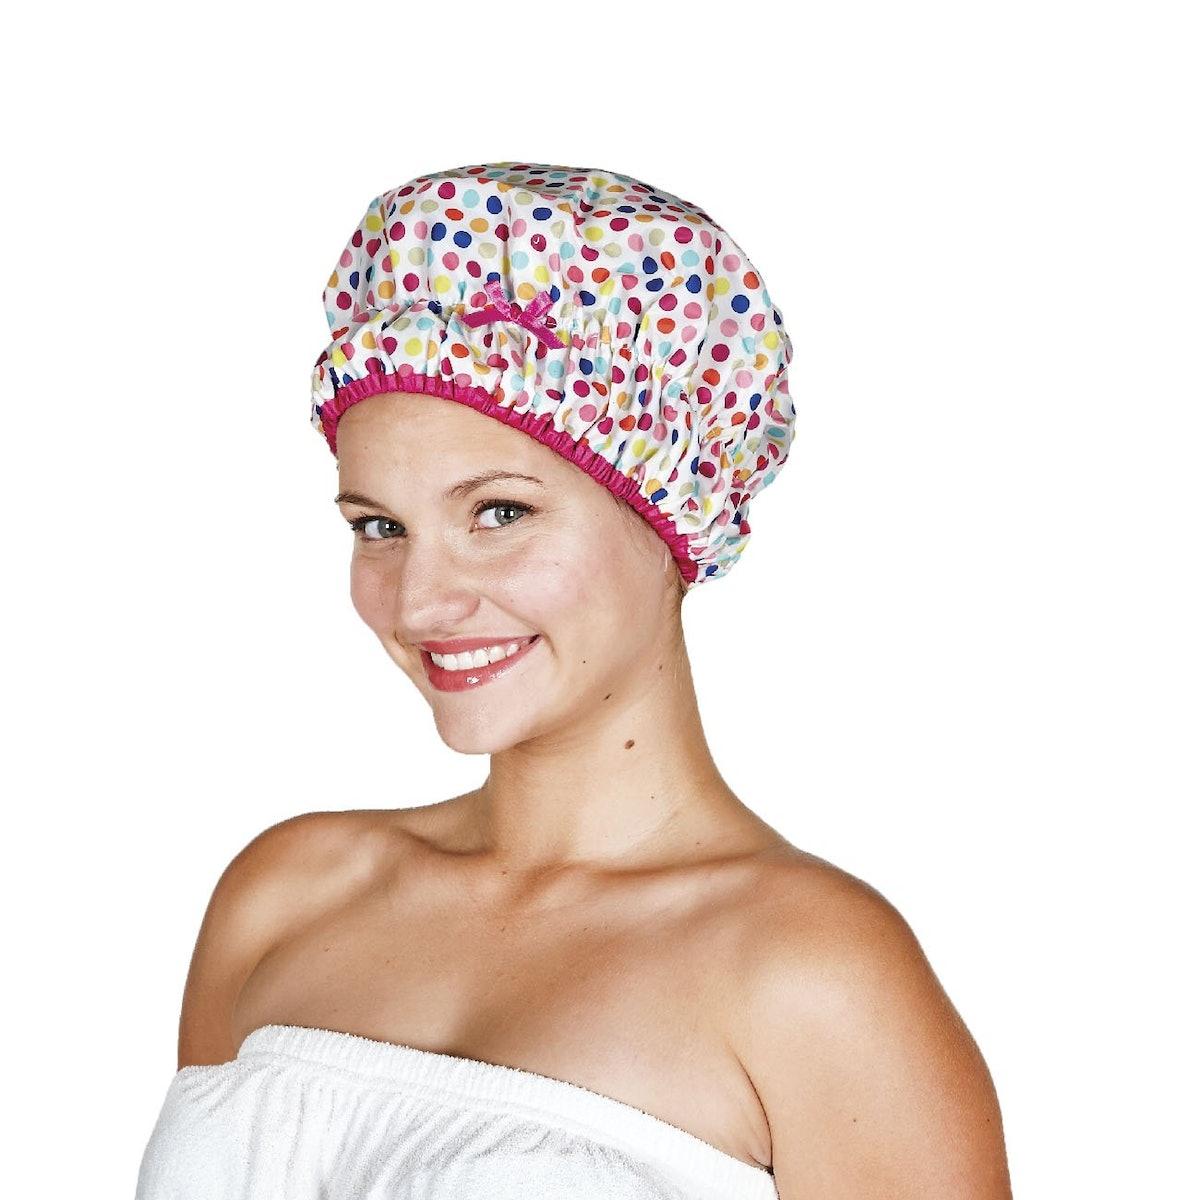 Betty Drain Fashionista Shower Cap